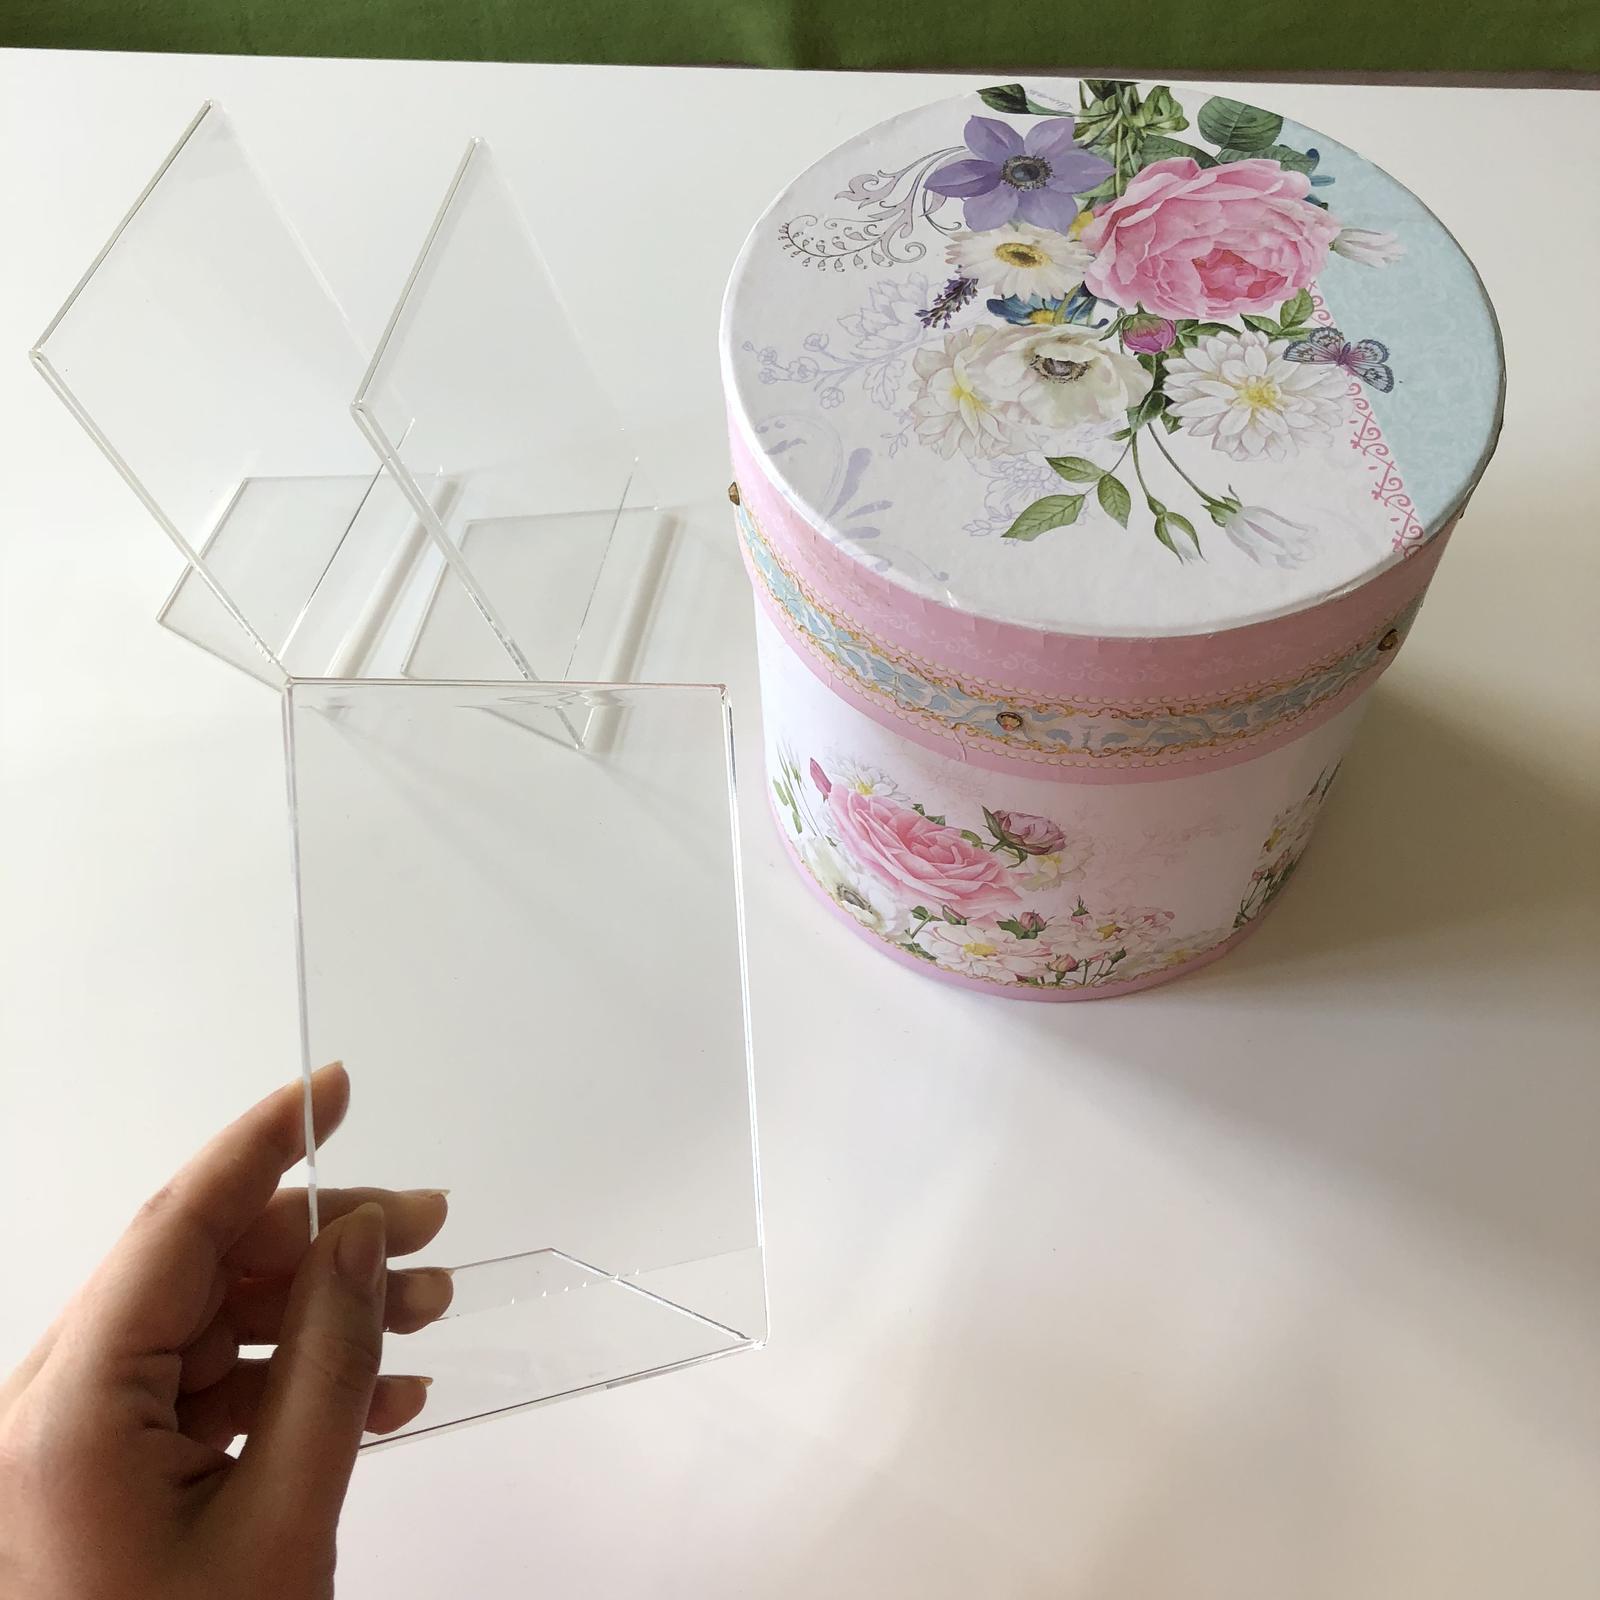 Kulatá romantická krabice - Obrázek č. 1